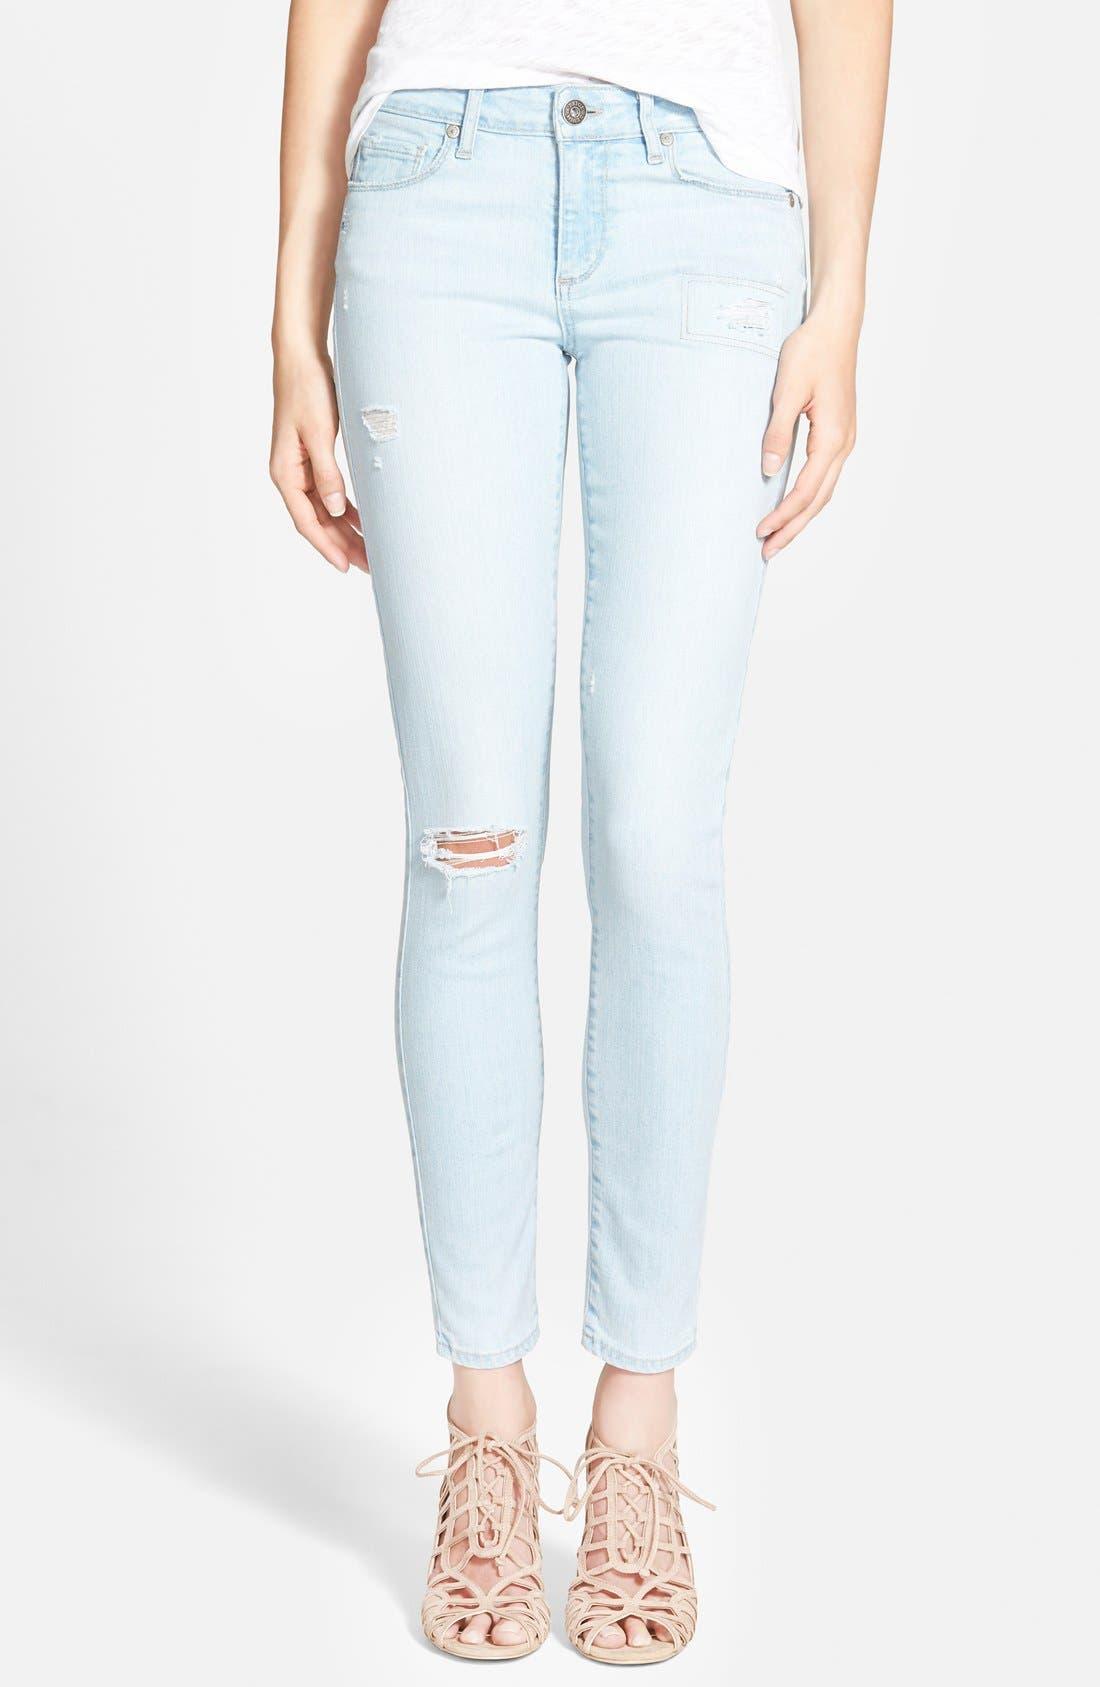 Alternate Image 1 Selected - Paige Denim 'Verdugo' Ultra Skinny Jeans (Cece  Destructed)